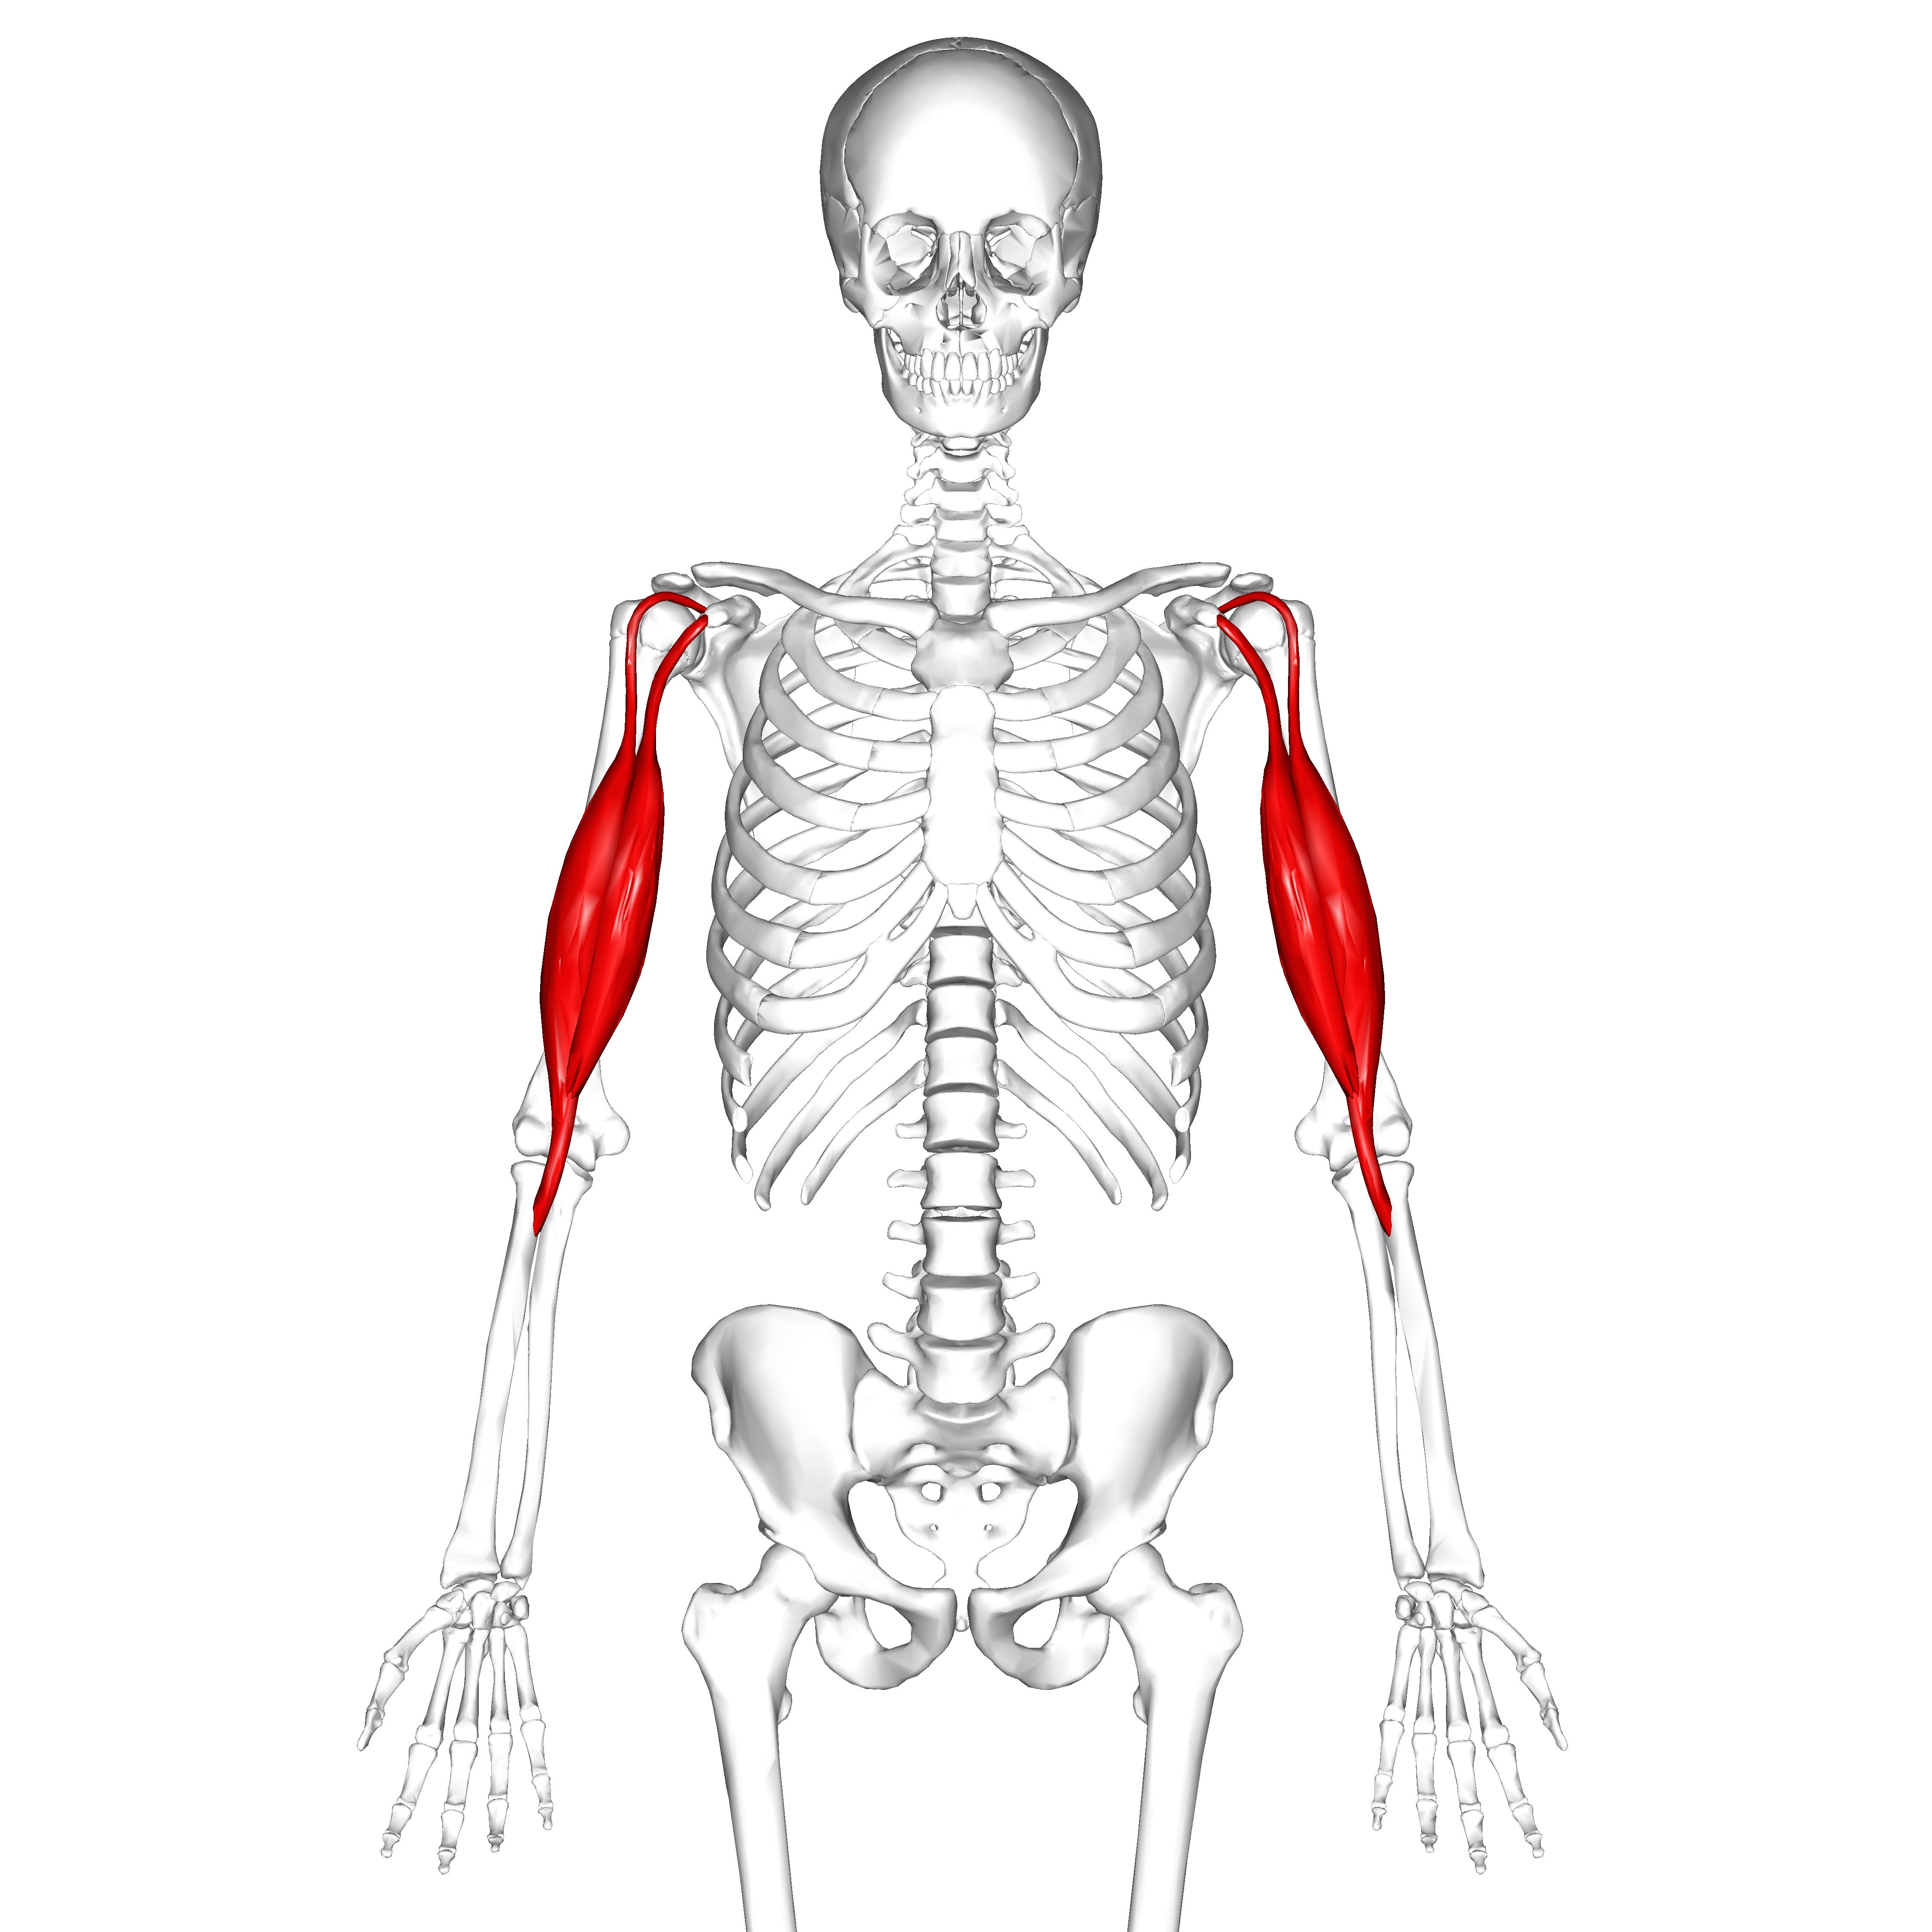 biceps brachii muscle - photo #3